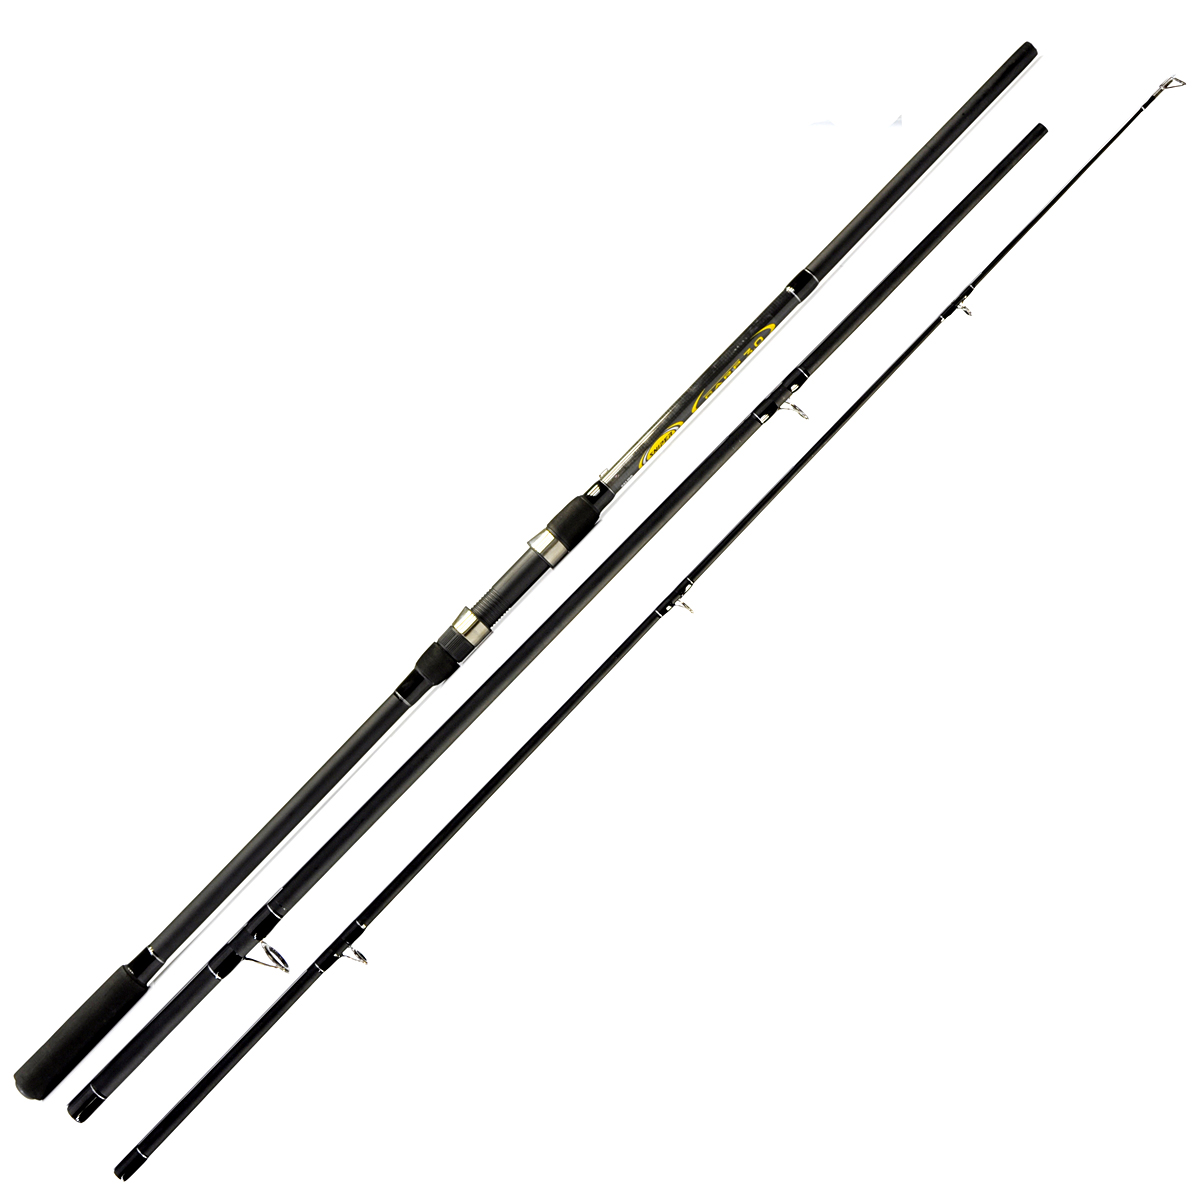 Удилище карповое Salmo Sniper CARP 3.00lb/3.60, длина 3,6м, 5-25г